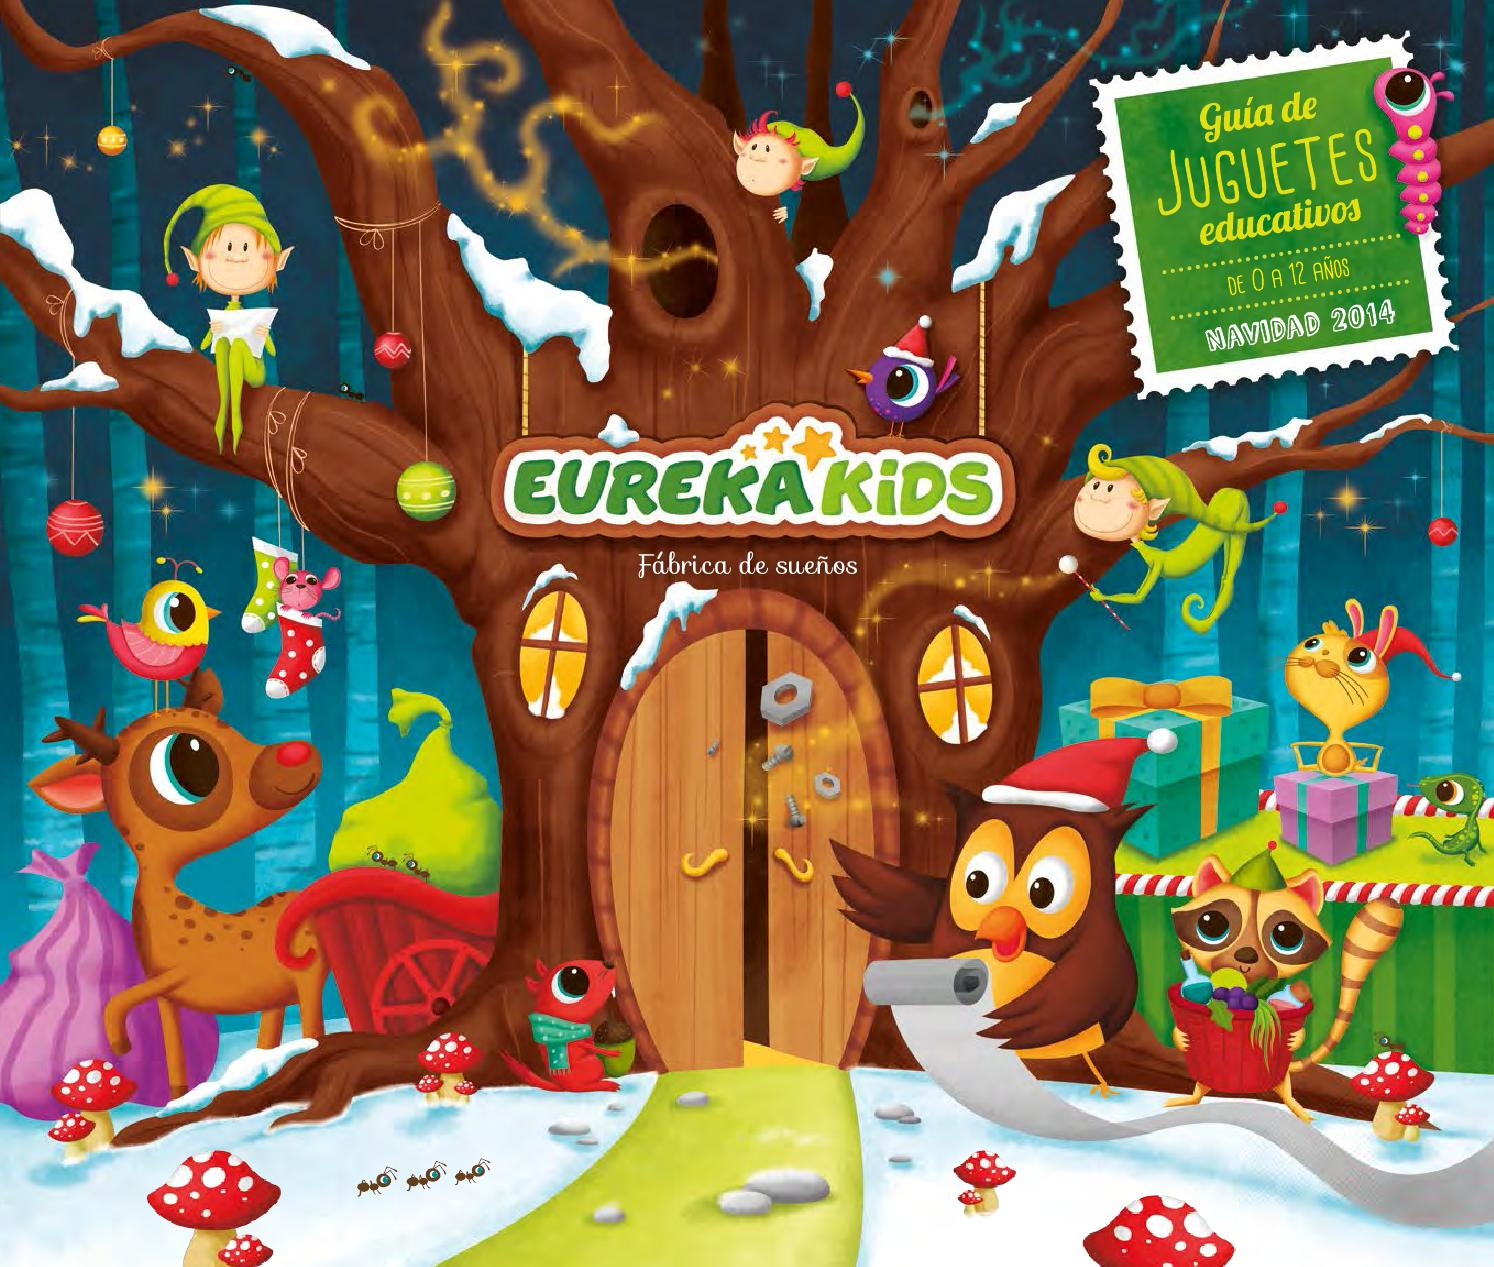 Eurekakids Navidad 2015 Juguetes Educativos By Eurekakids Issuu